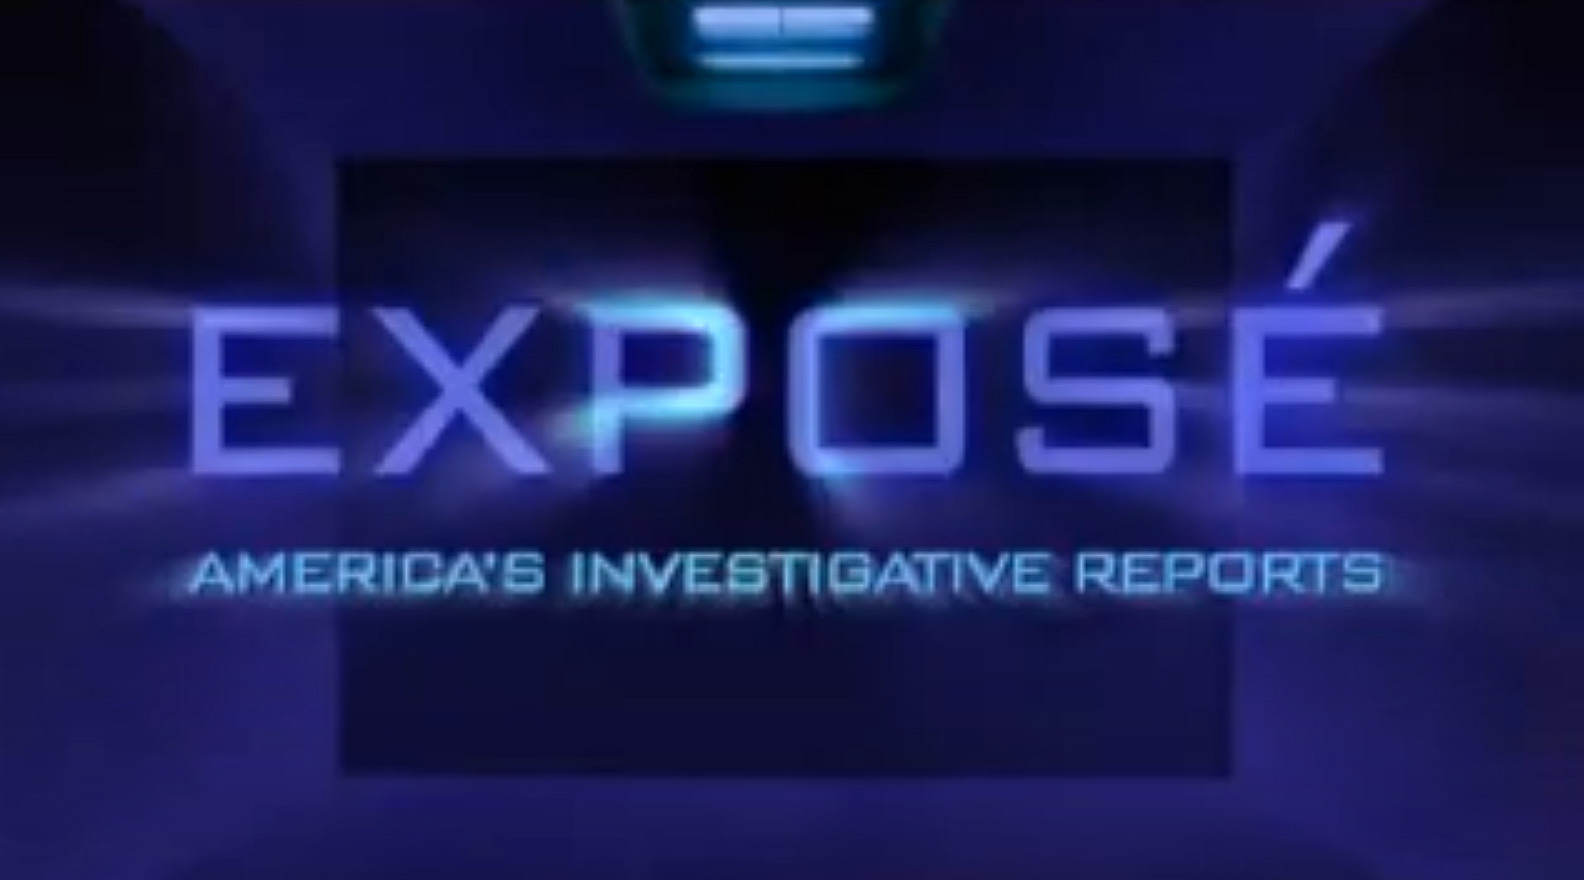 EXPOSÉ: America's Investigative Reports